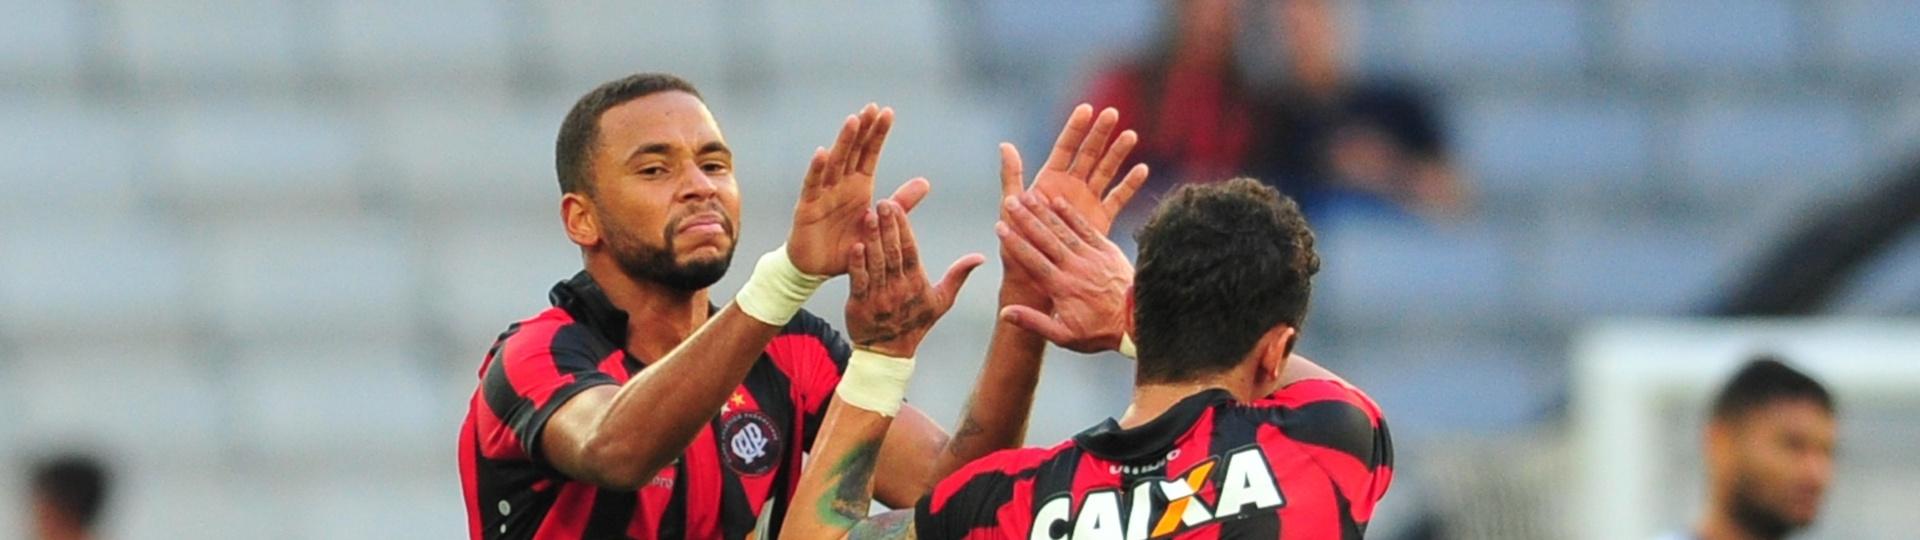 Hernani marca para o Atlético-PR contra o Fluminense